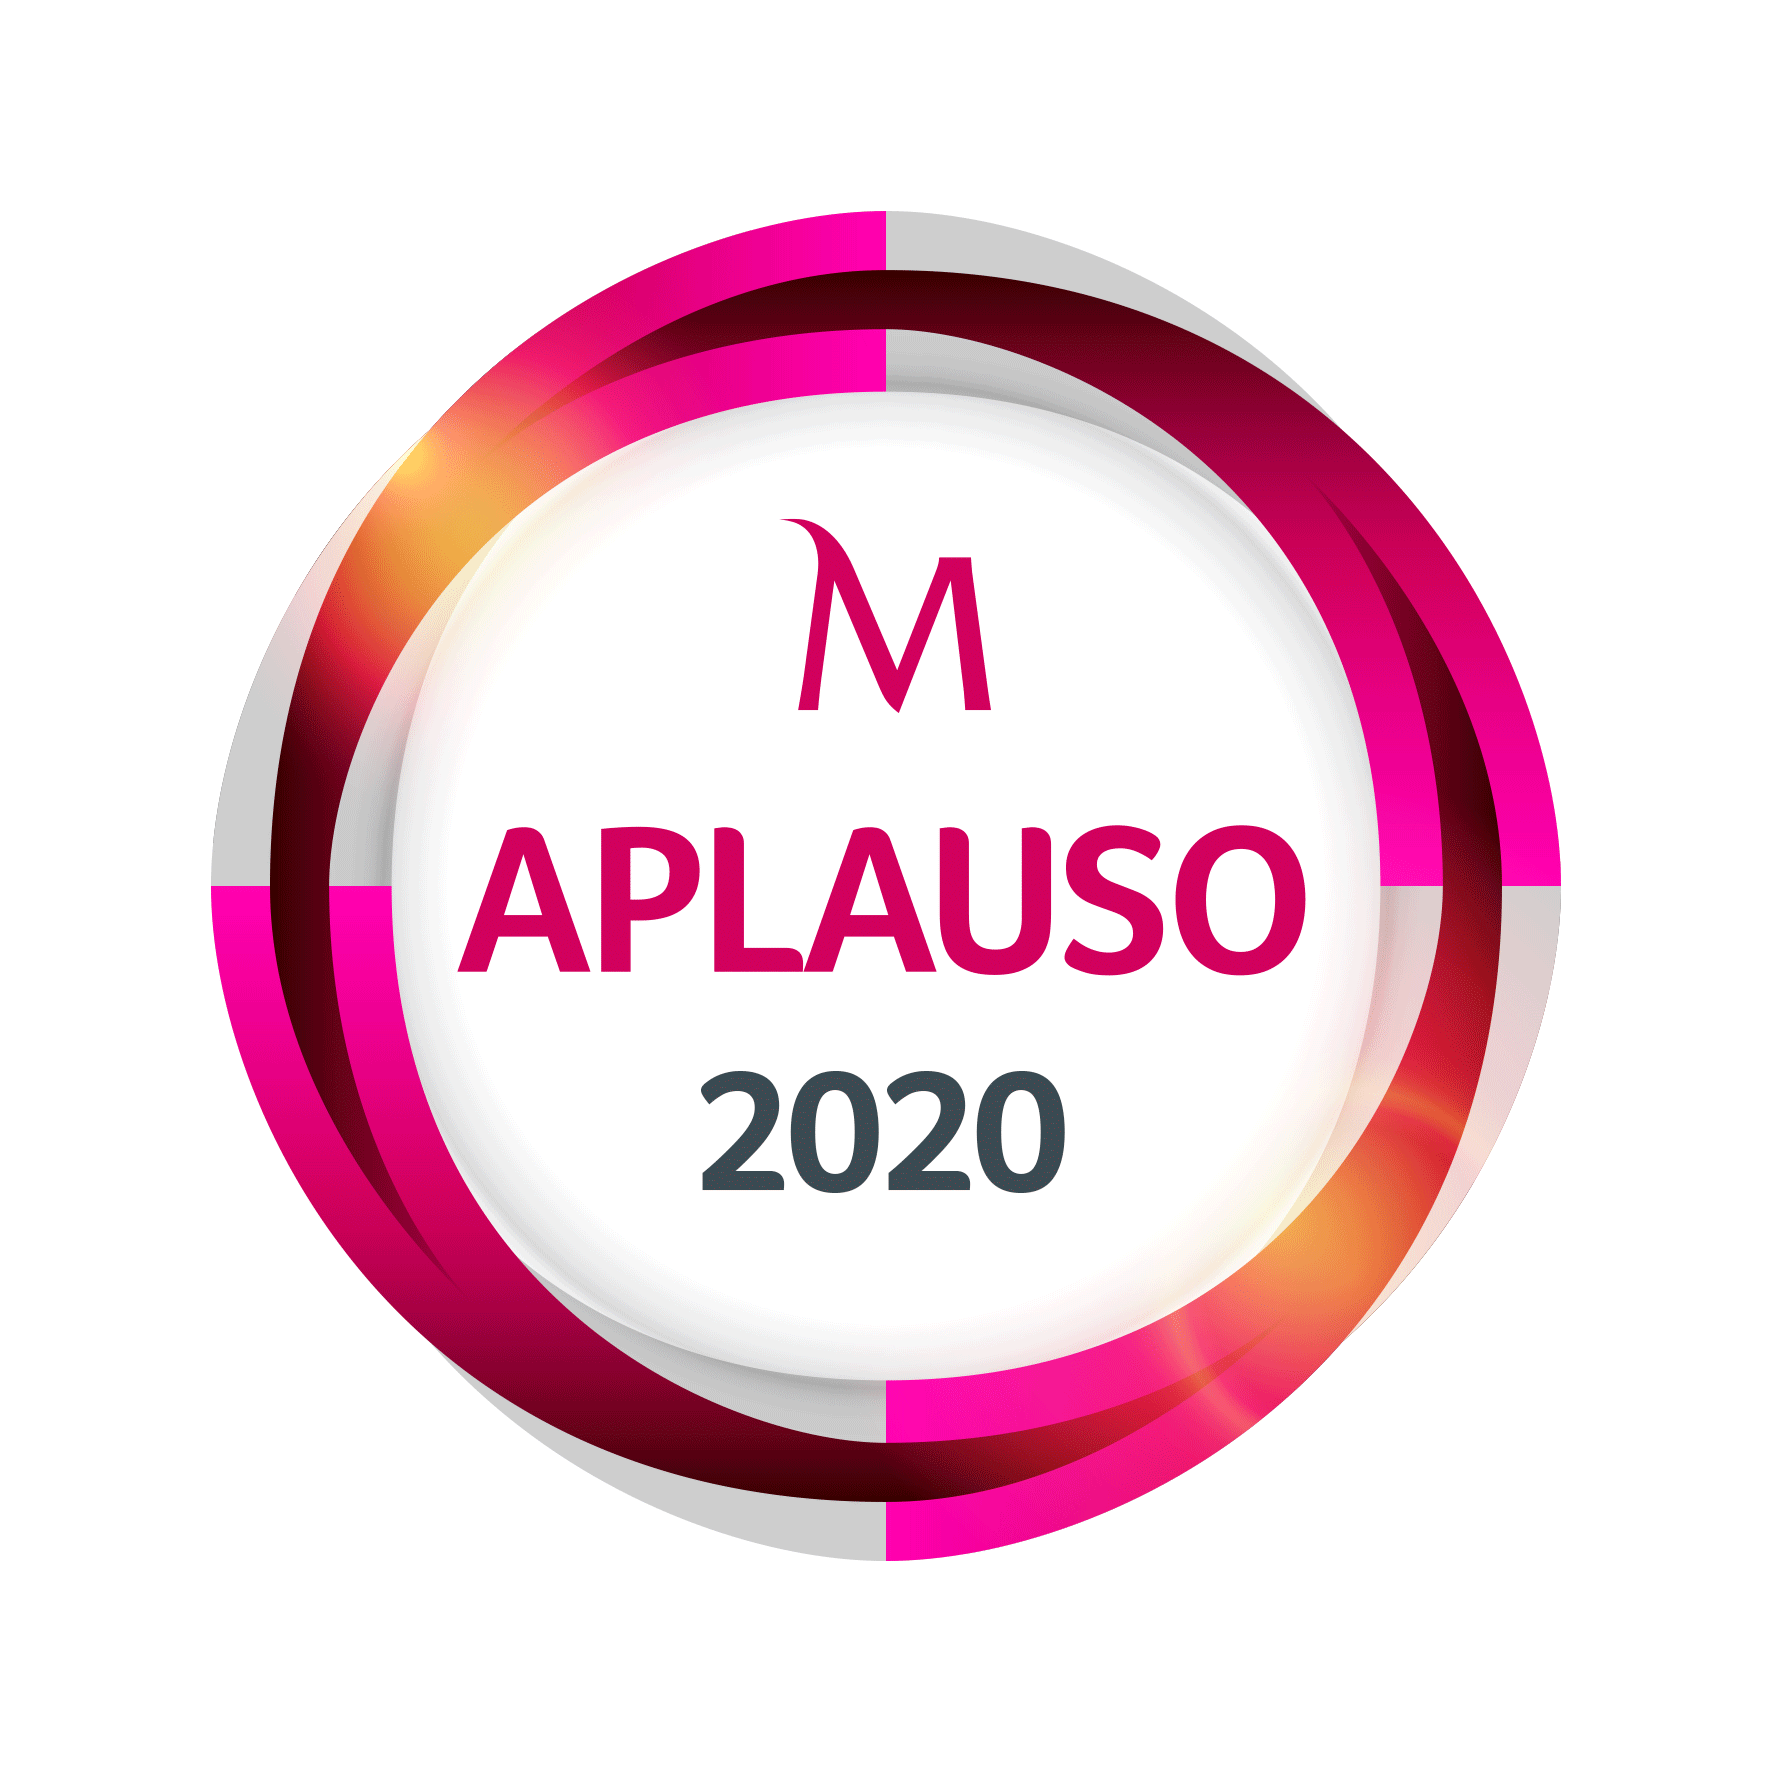 Softpack - selo Parceiro Aplauso 2020 Millennium Bcp